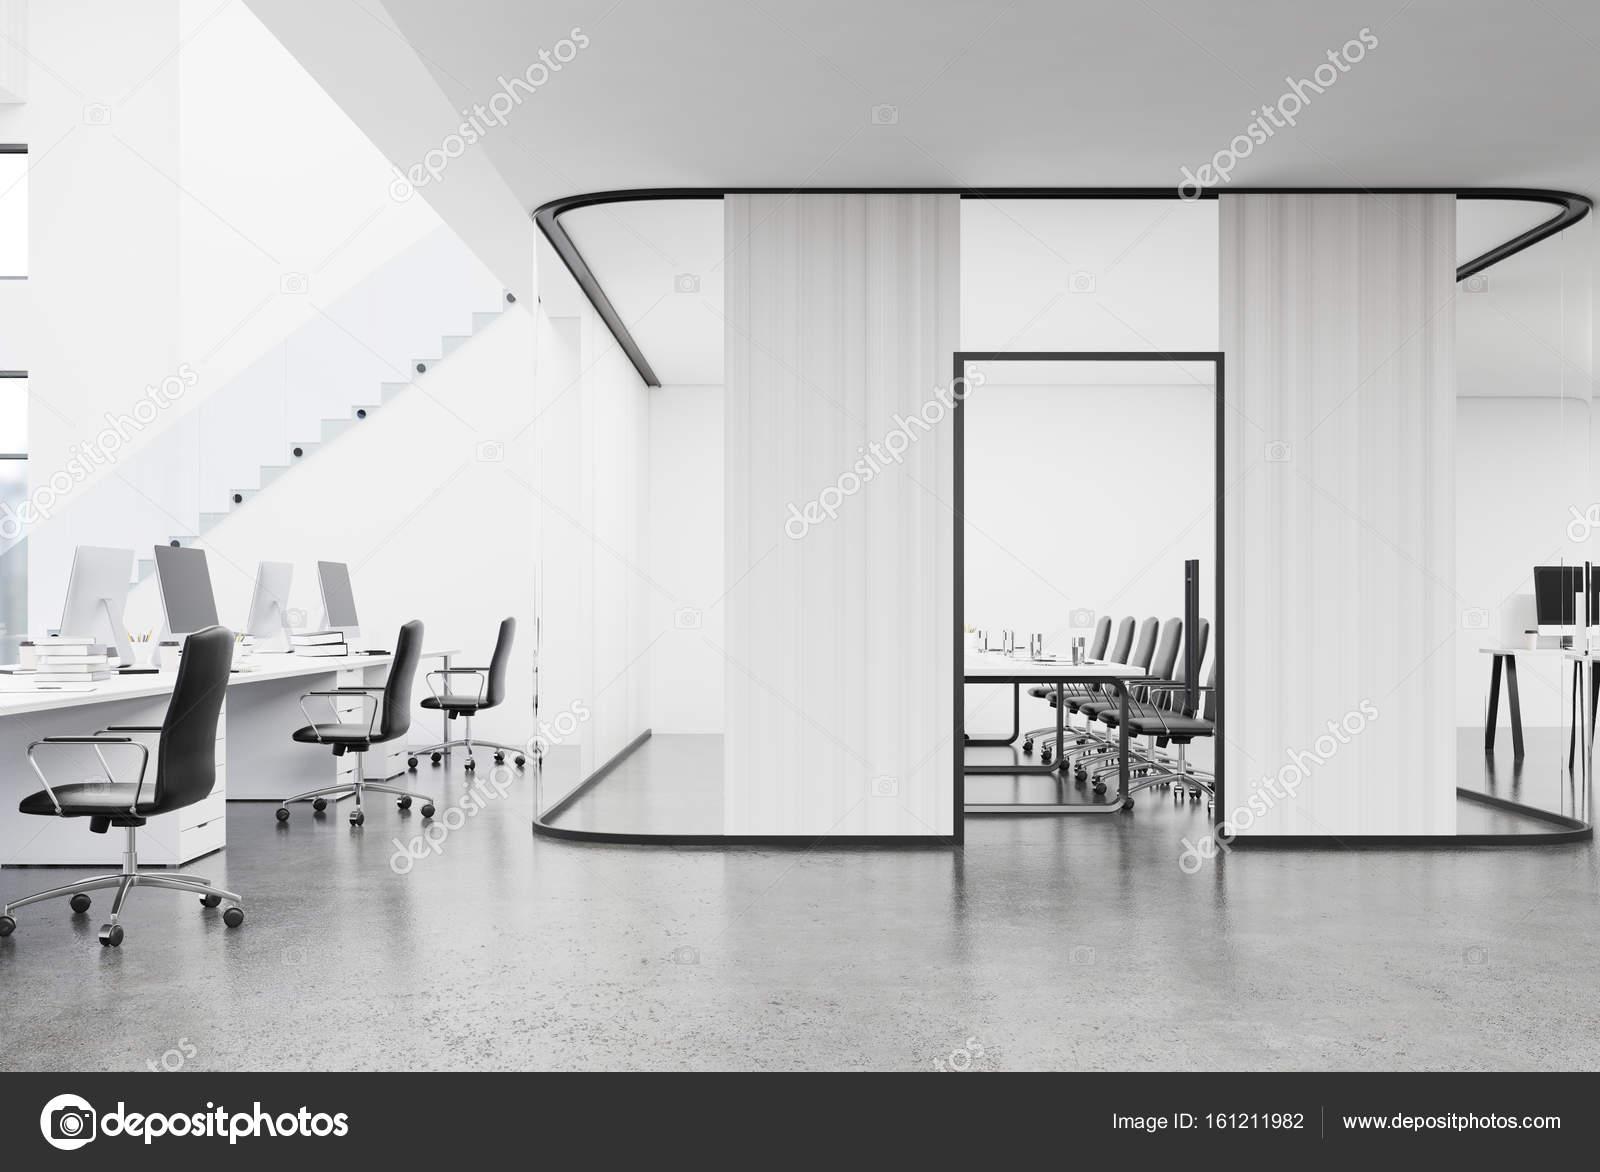 Offenen Raum Büro- und Besprechungsräume — Stockfoto ...